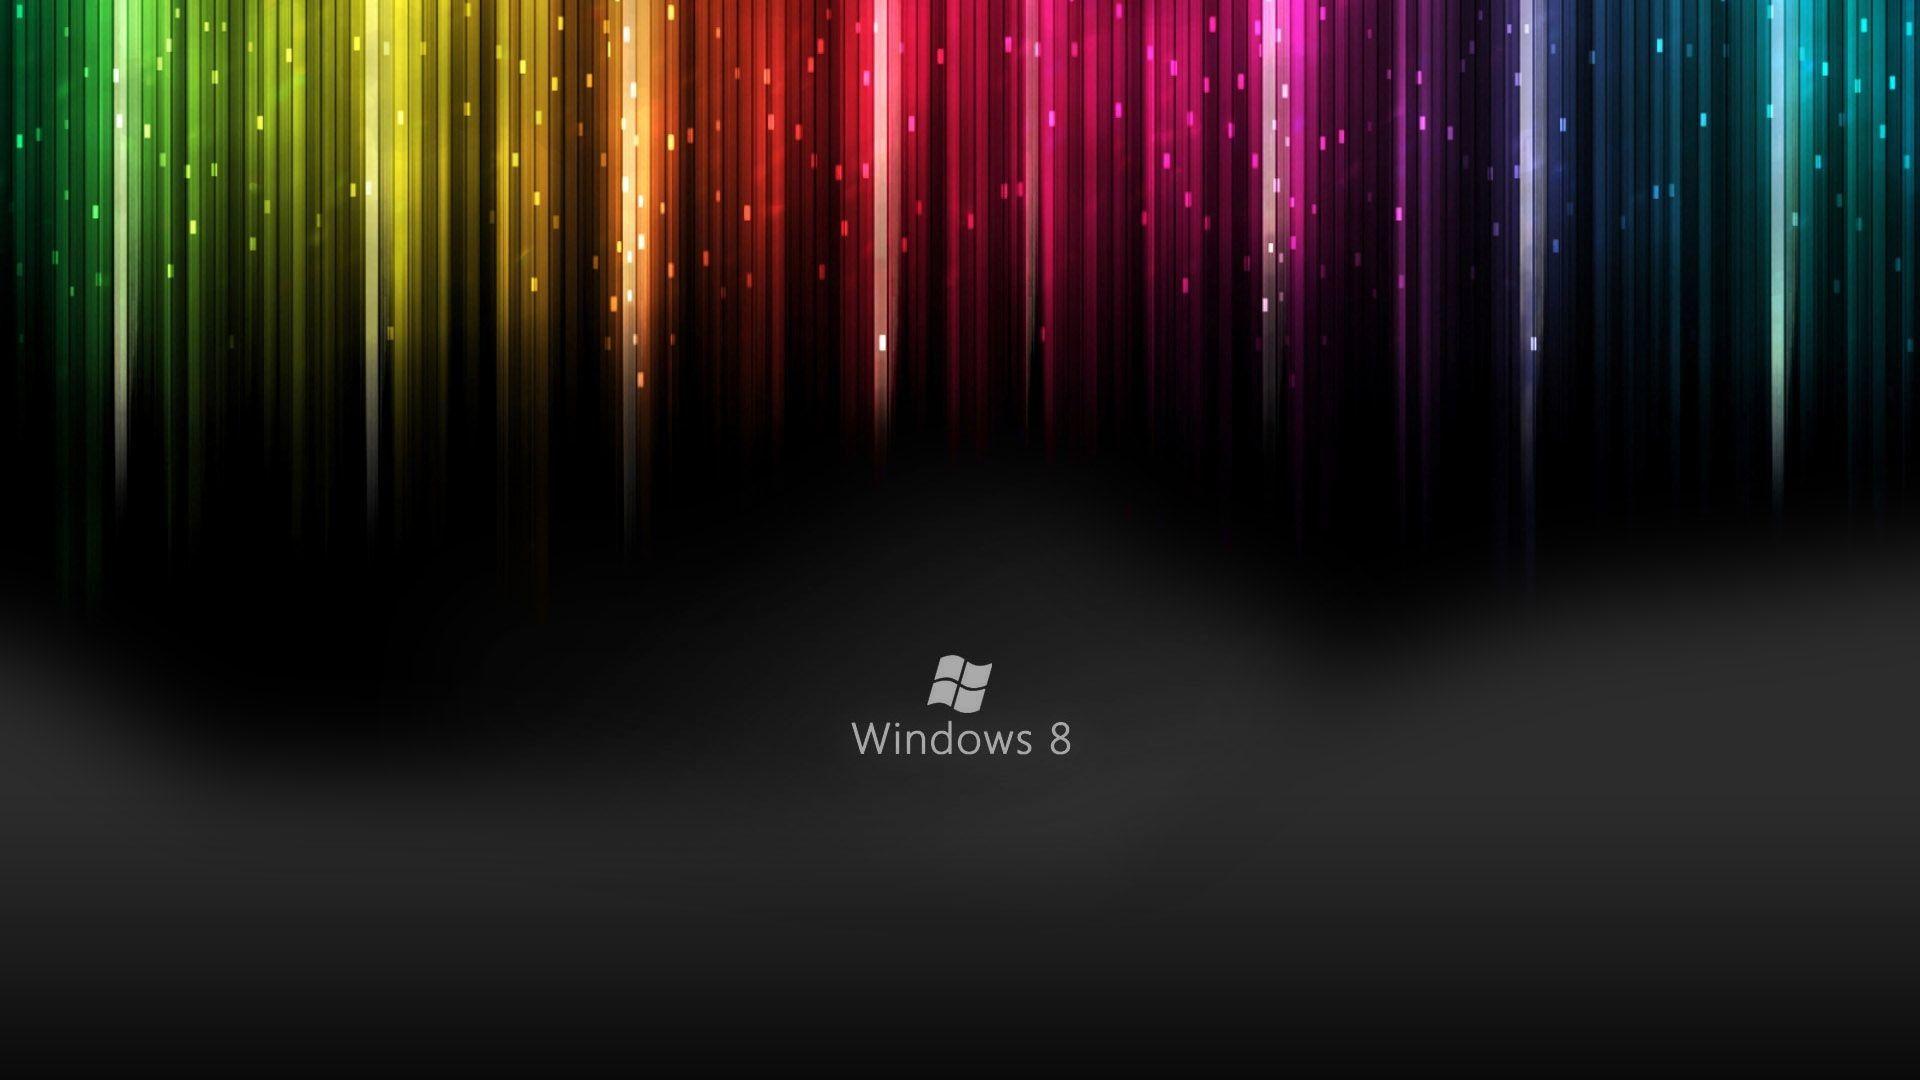 Full Hd Wallpaper For Windows 10 Laptop Fs Mag Computer Wallpaper Hd Hd Wallpapers For Laptop 3d Desktop Wallpaper